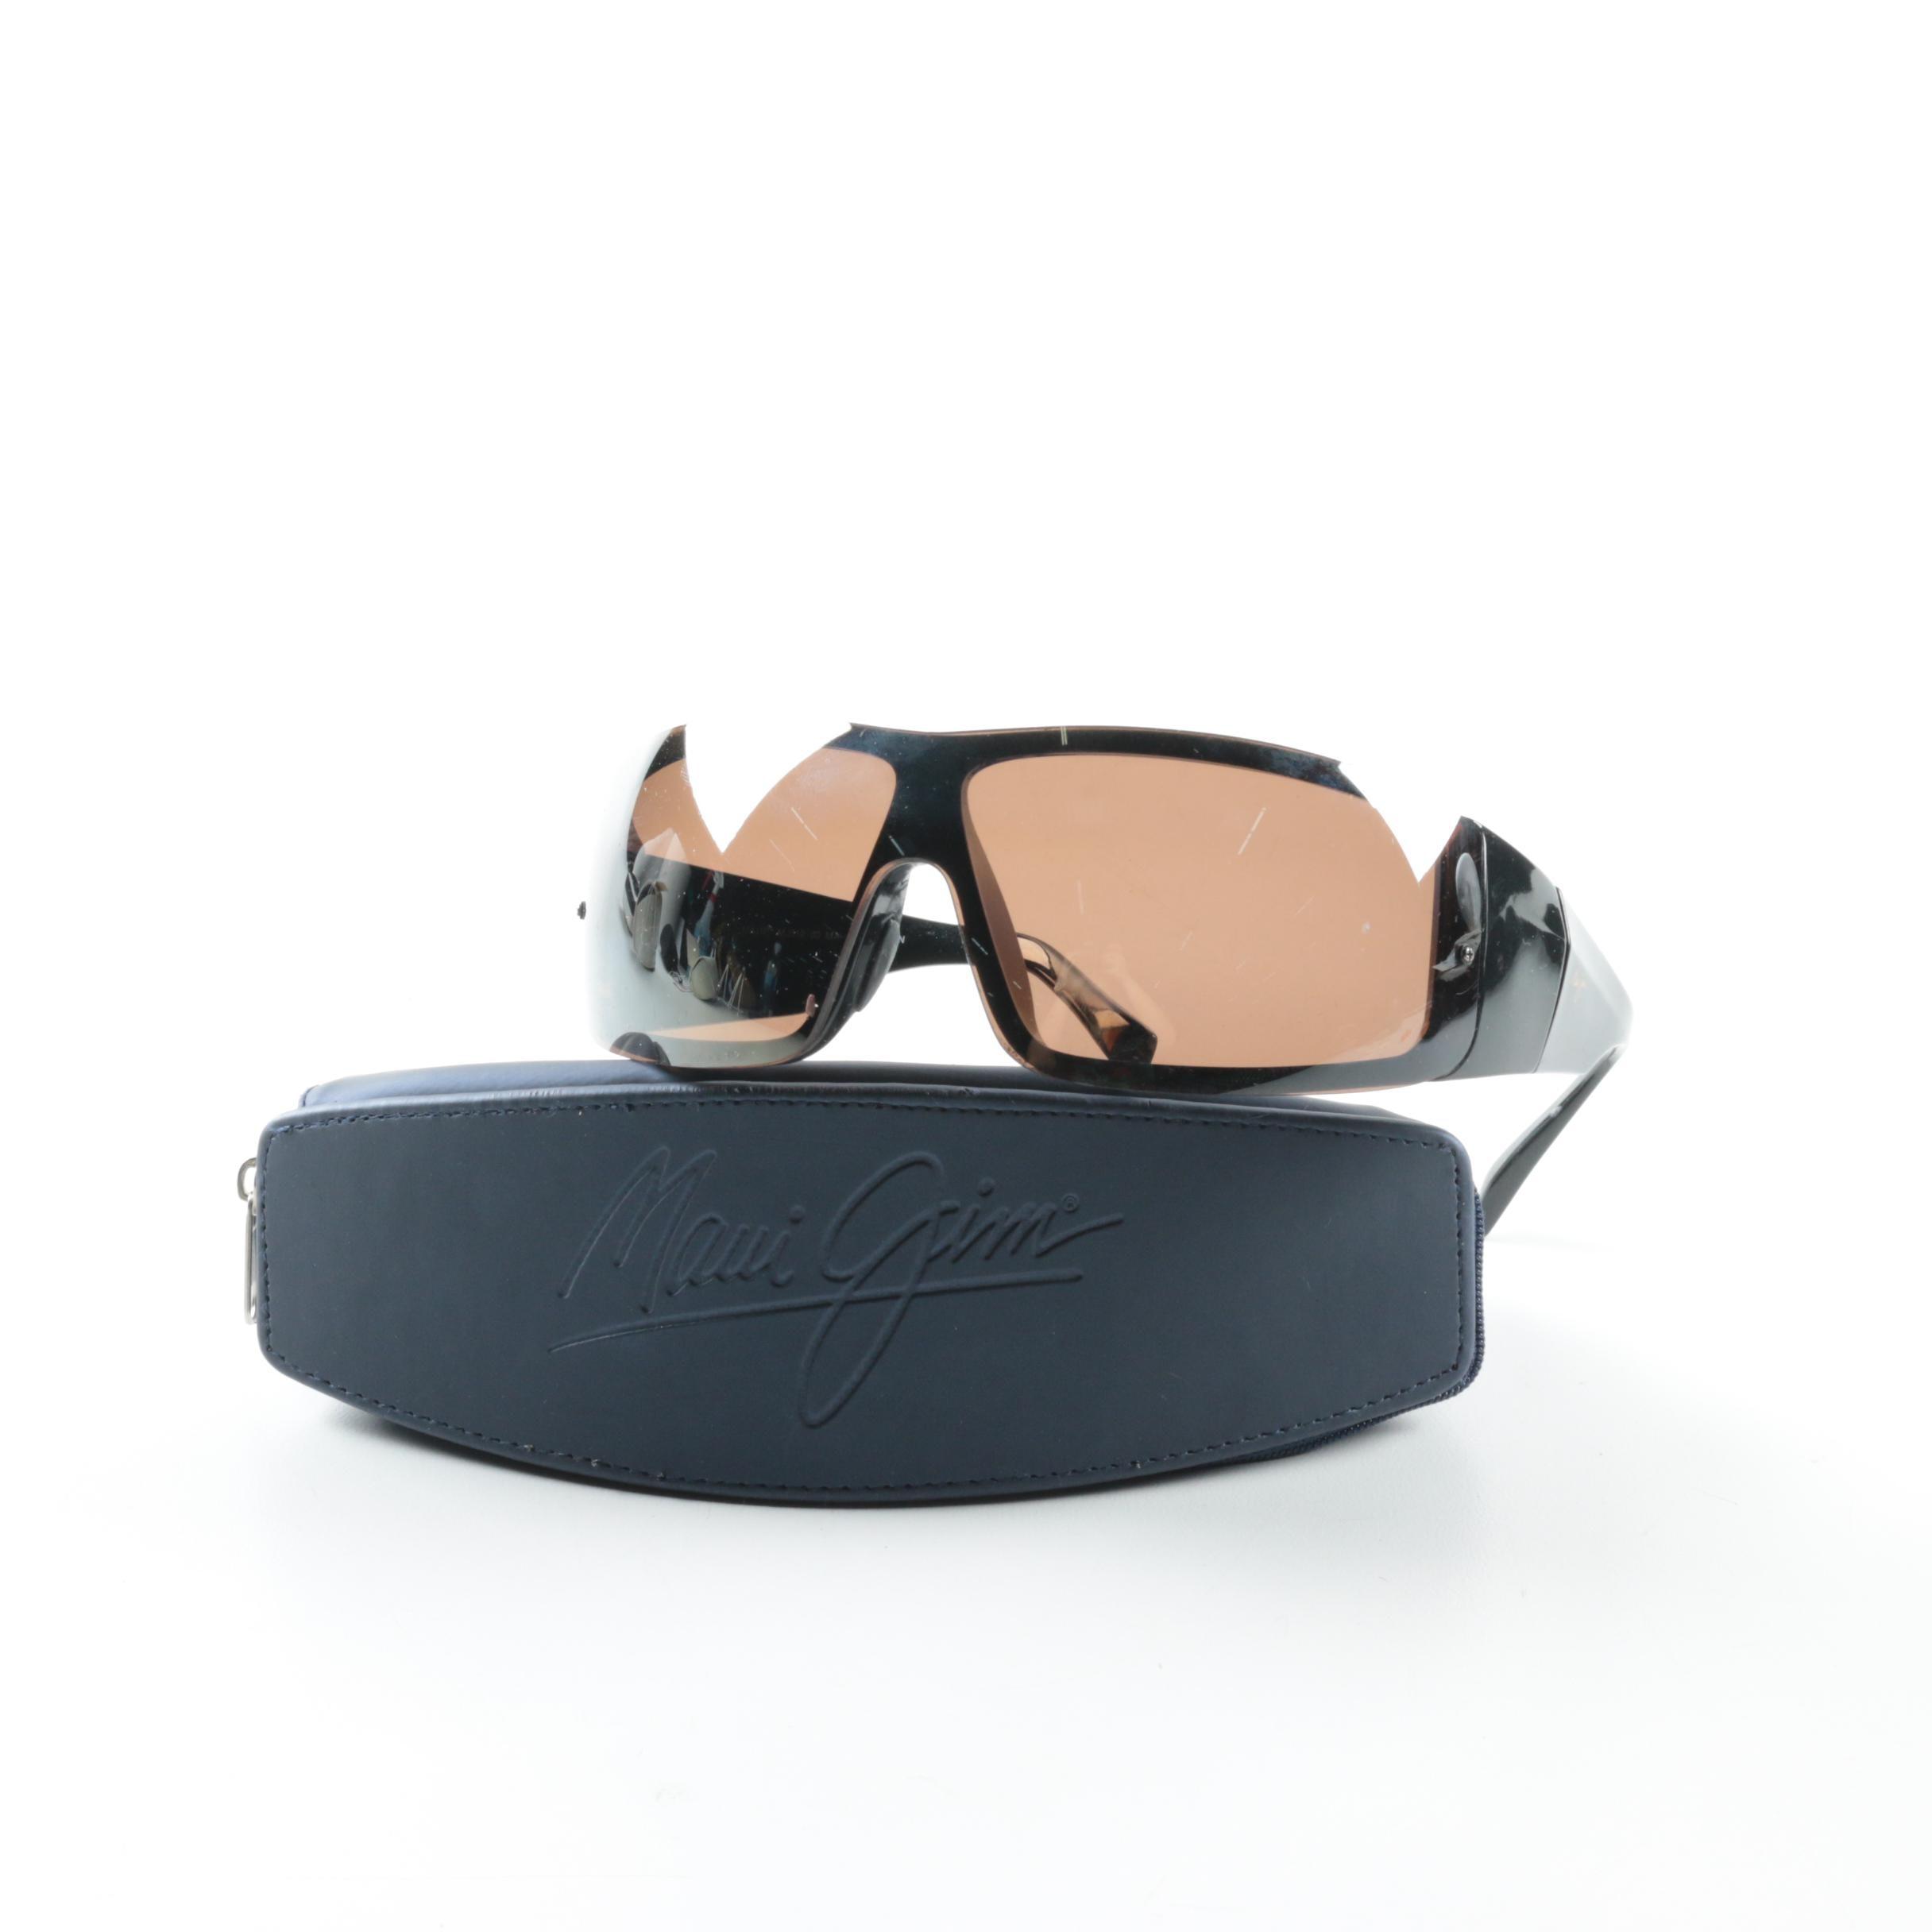 Maui Jim MJ512-02 Wrap Sunglasses with Case